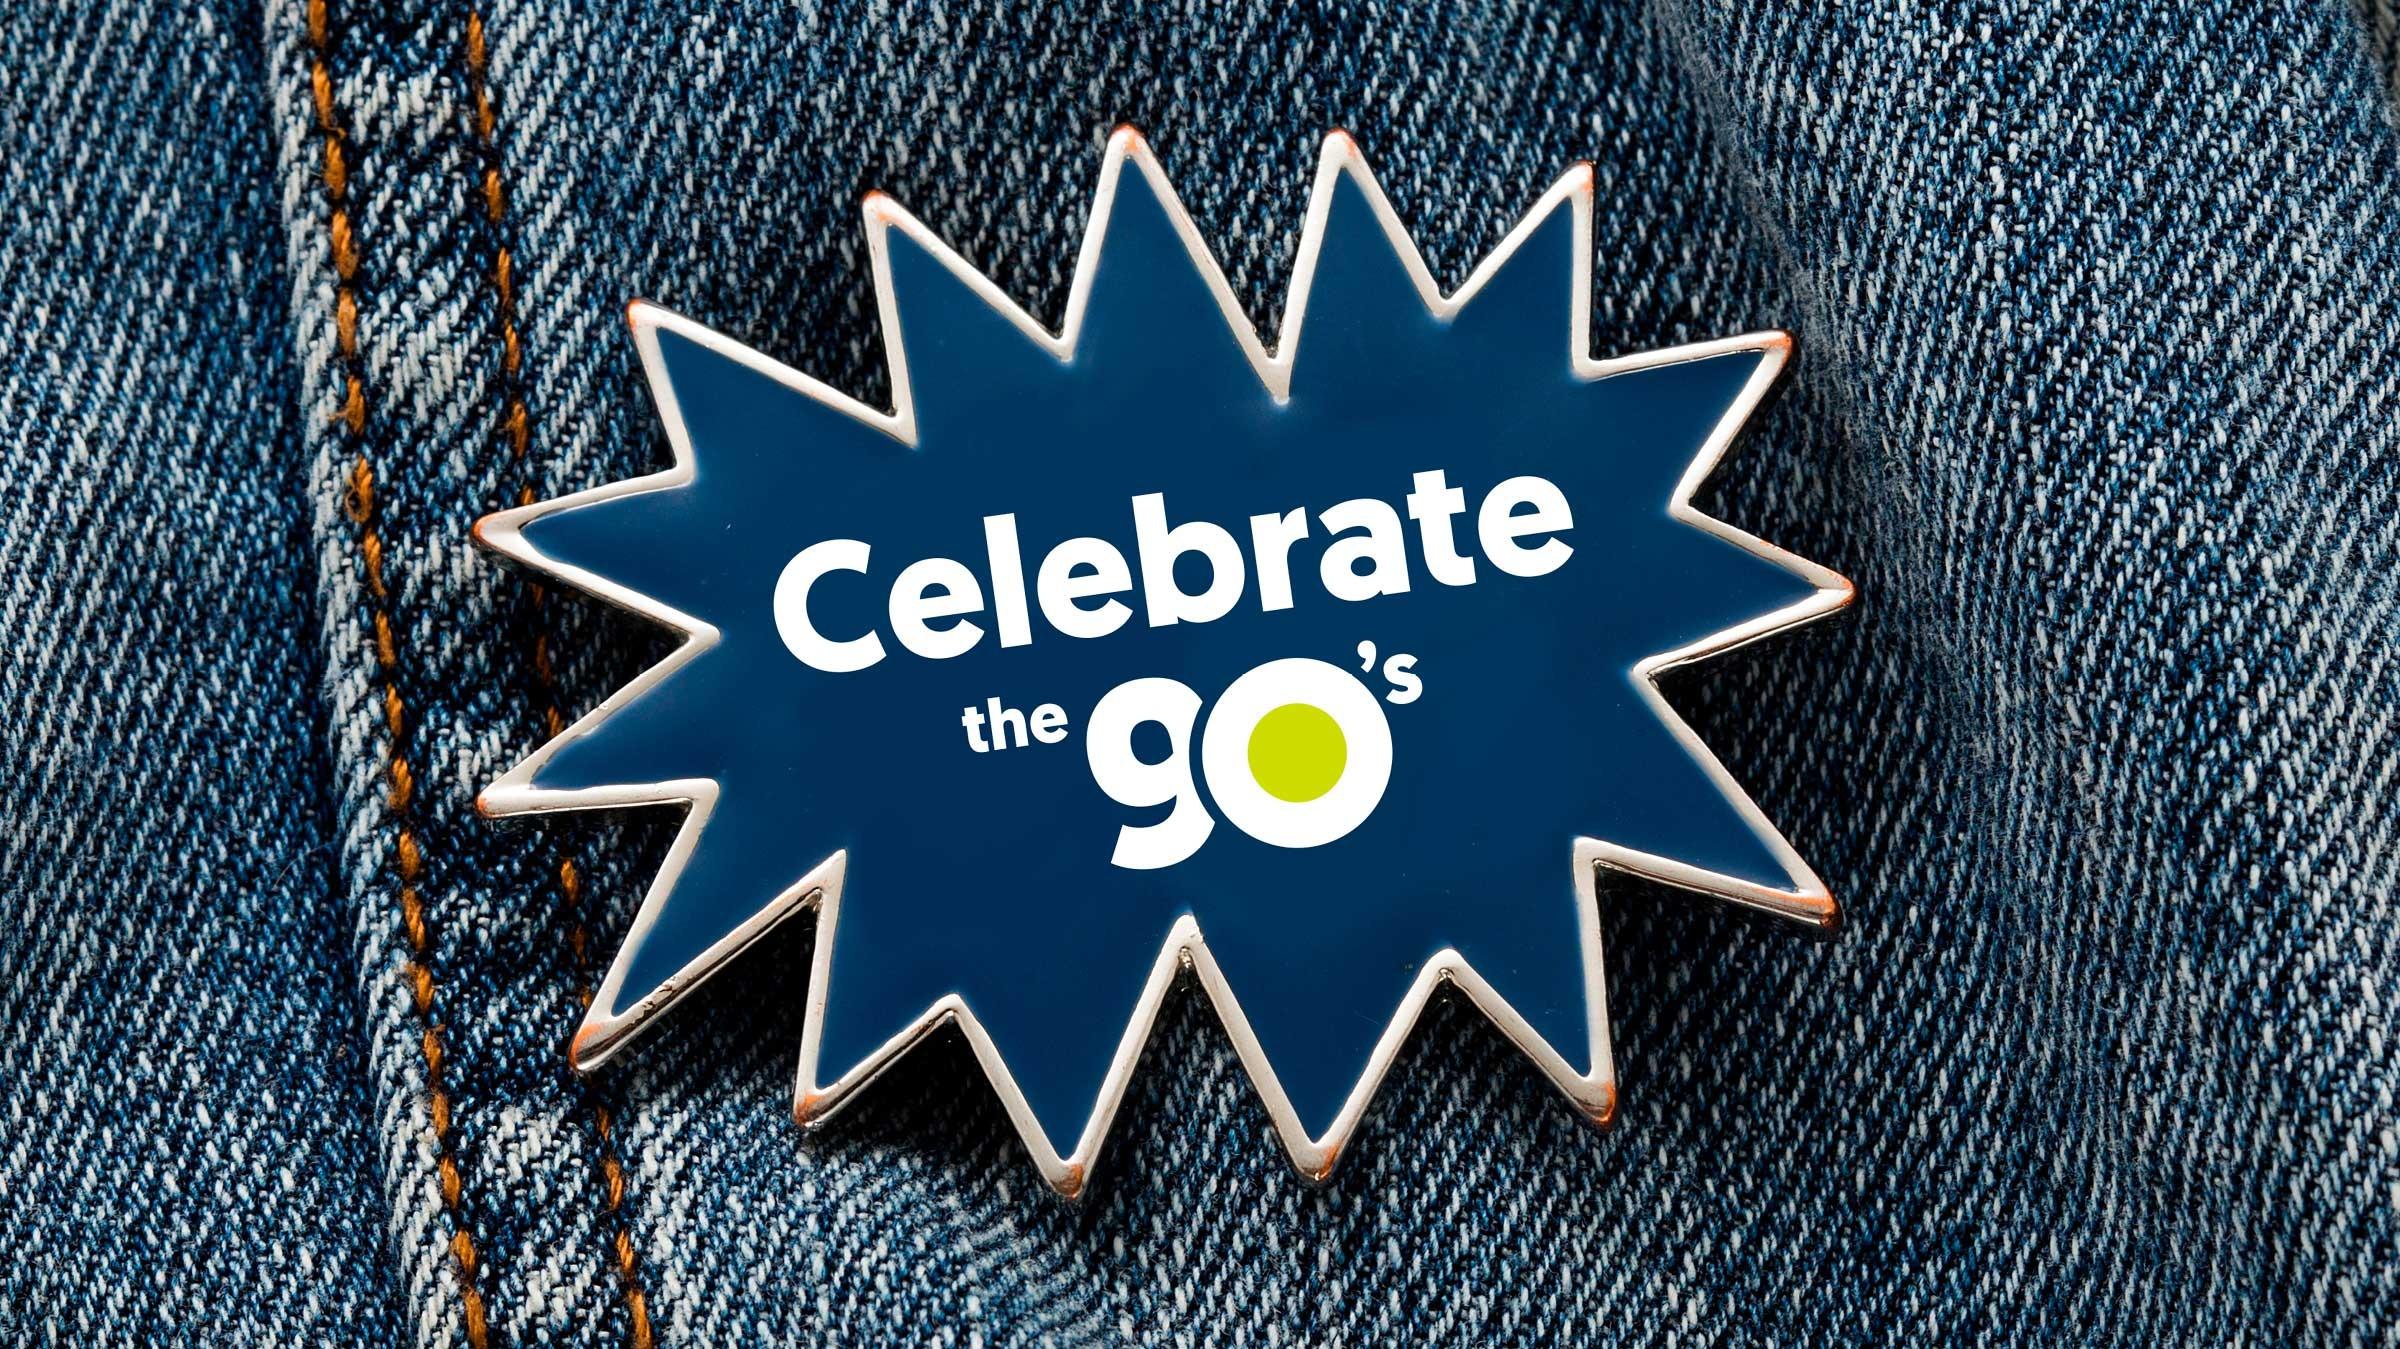 Celebrate the 90 s